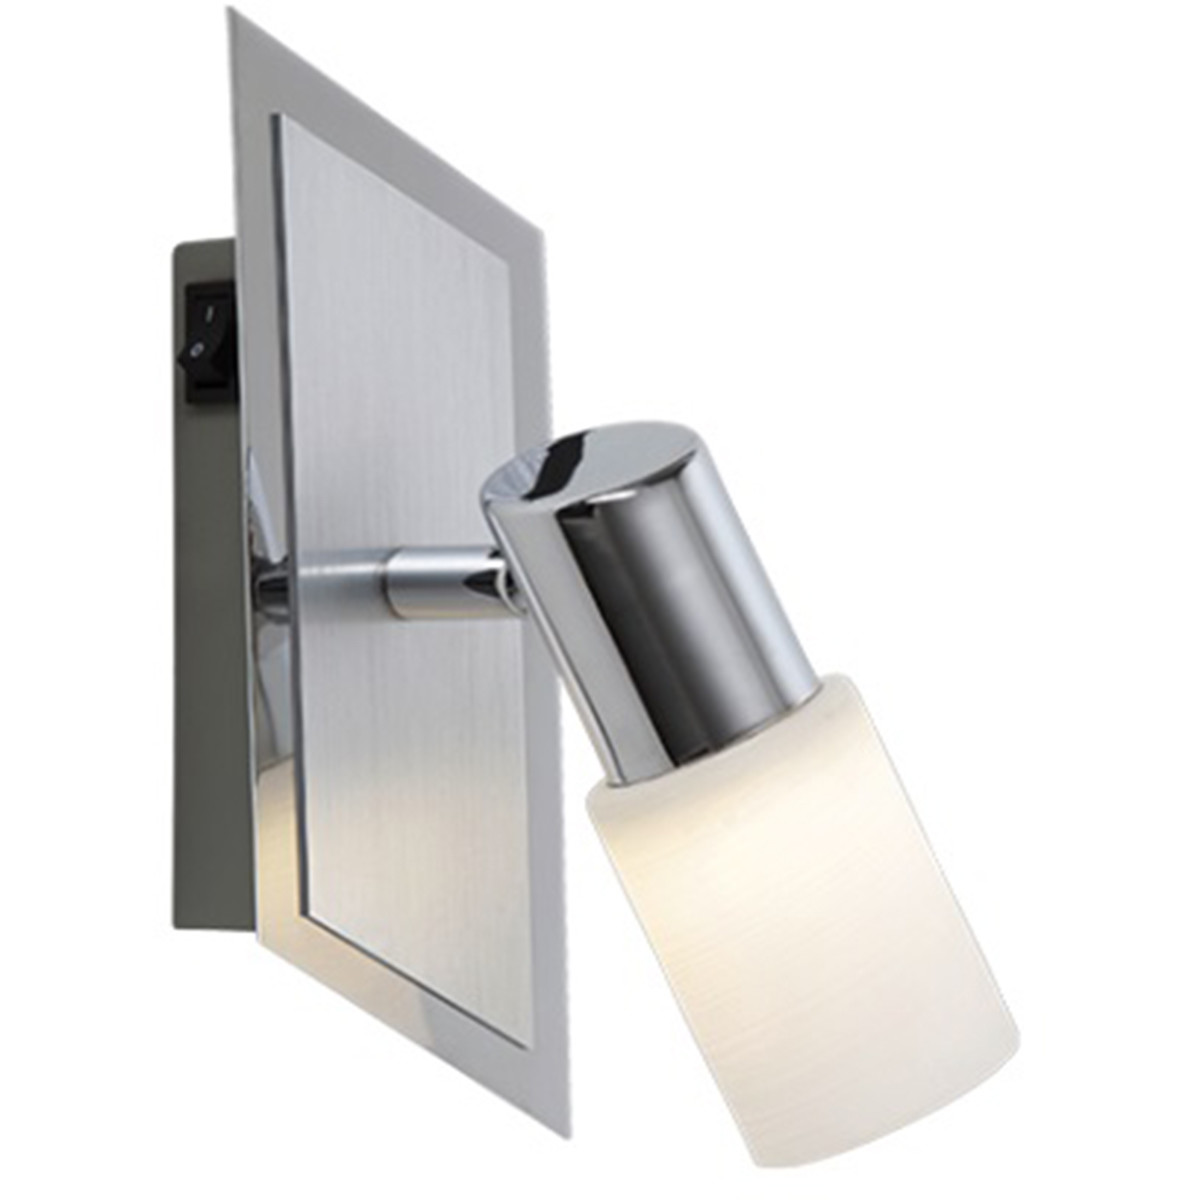 OSRAM - LED Wandspot - Trion Clupo - 4W - Warm Wit 3000K - 1-lichts - Rechthoek - Mat Chroom - Alumi